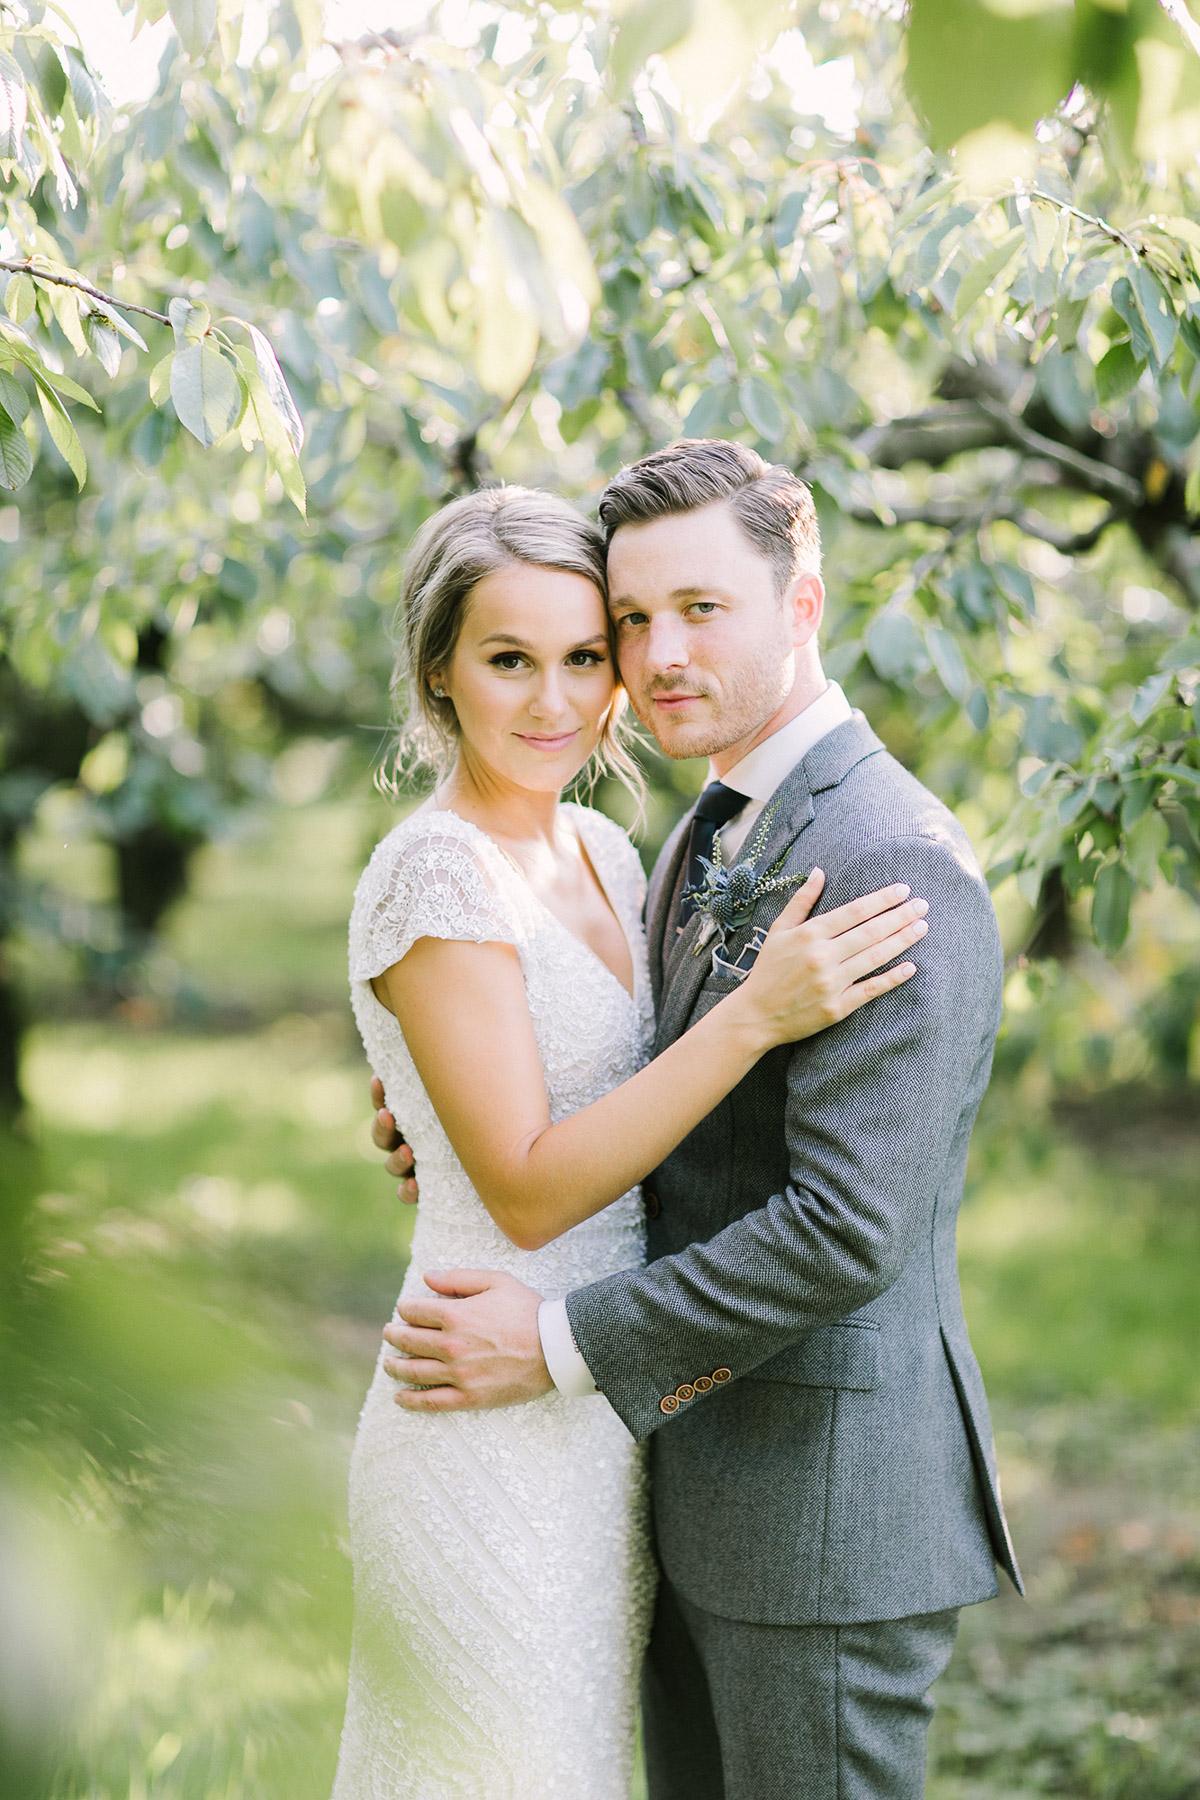 elizabeth-in-love-vineyard-bride-swish-list-cherry-avenue-farms-vineland-wedding-35.jpg